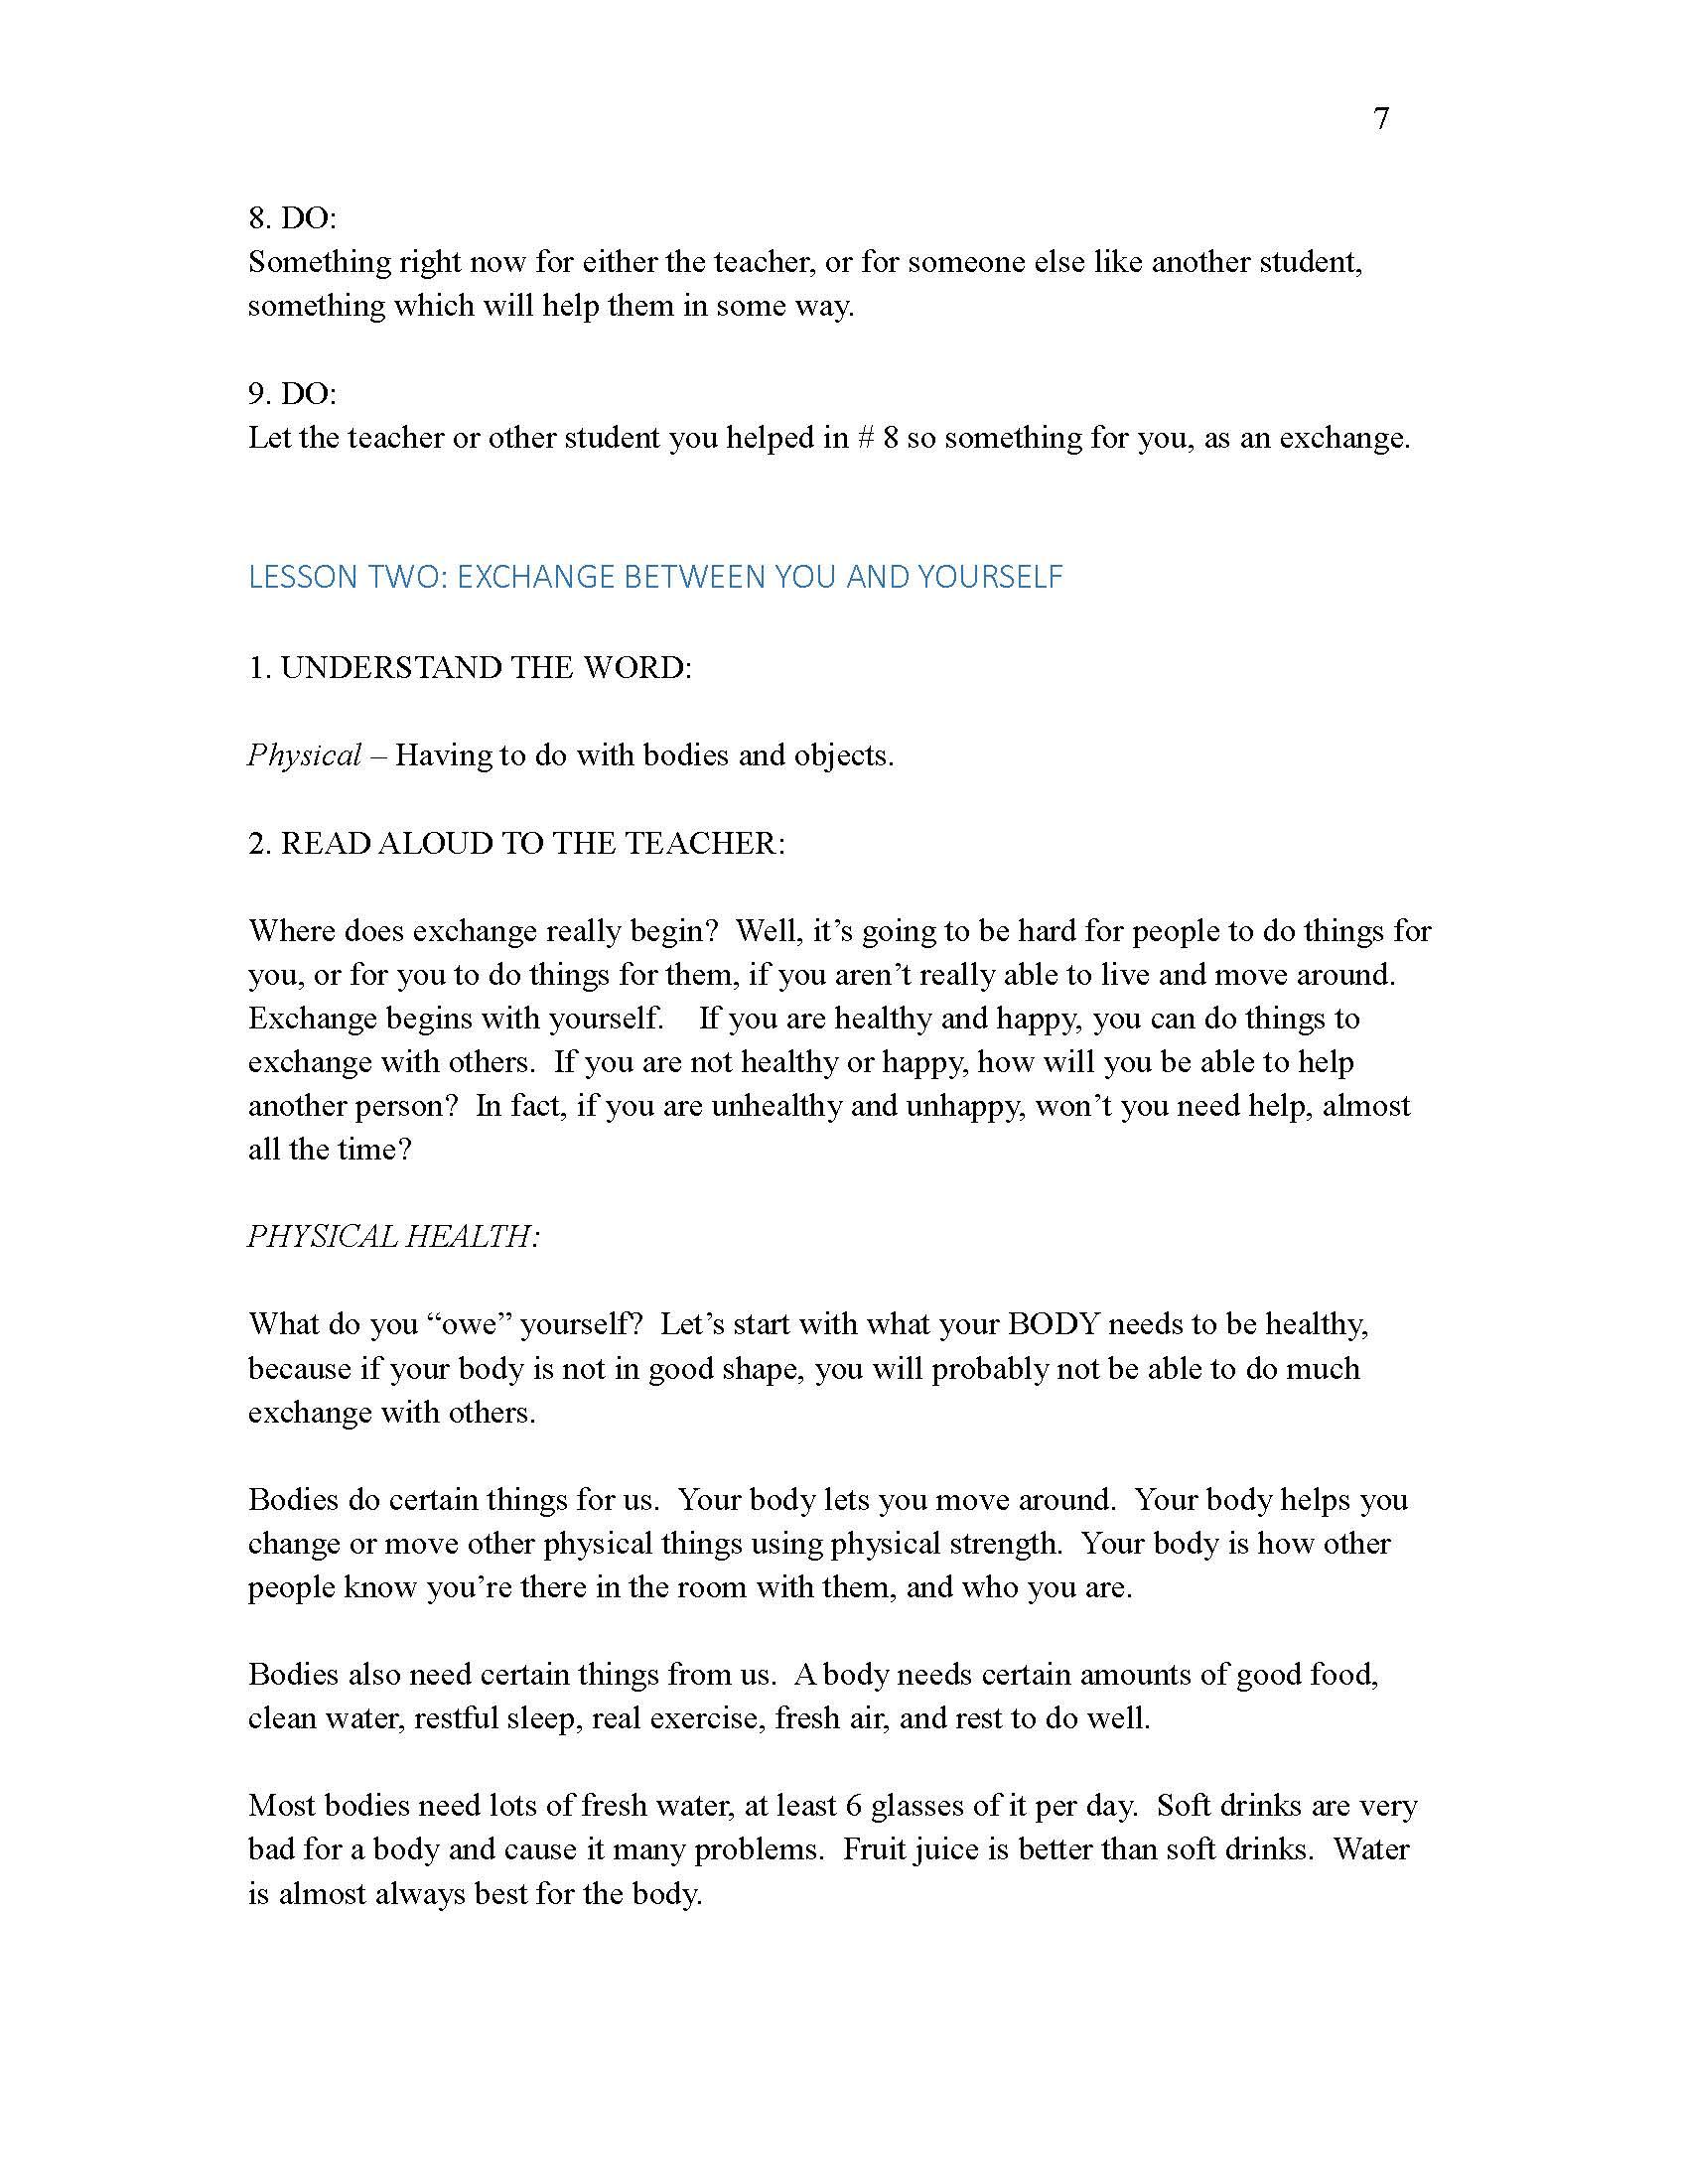 Step 2 Study & Life Skills 2 - Money & Exchange_Page_08.jpg